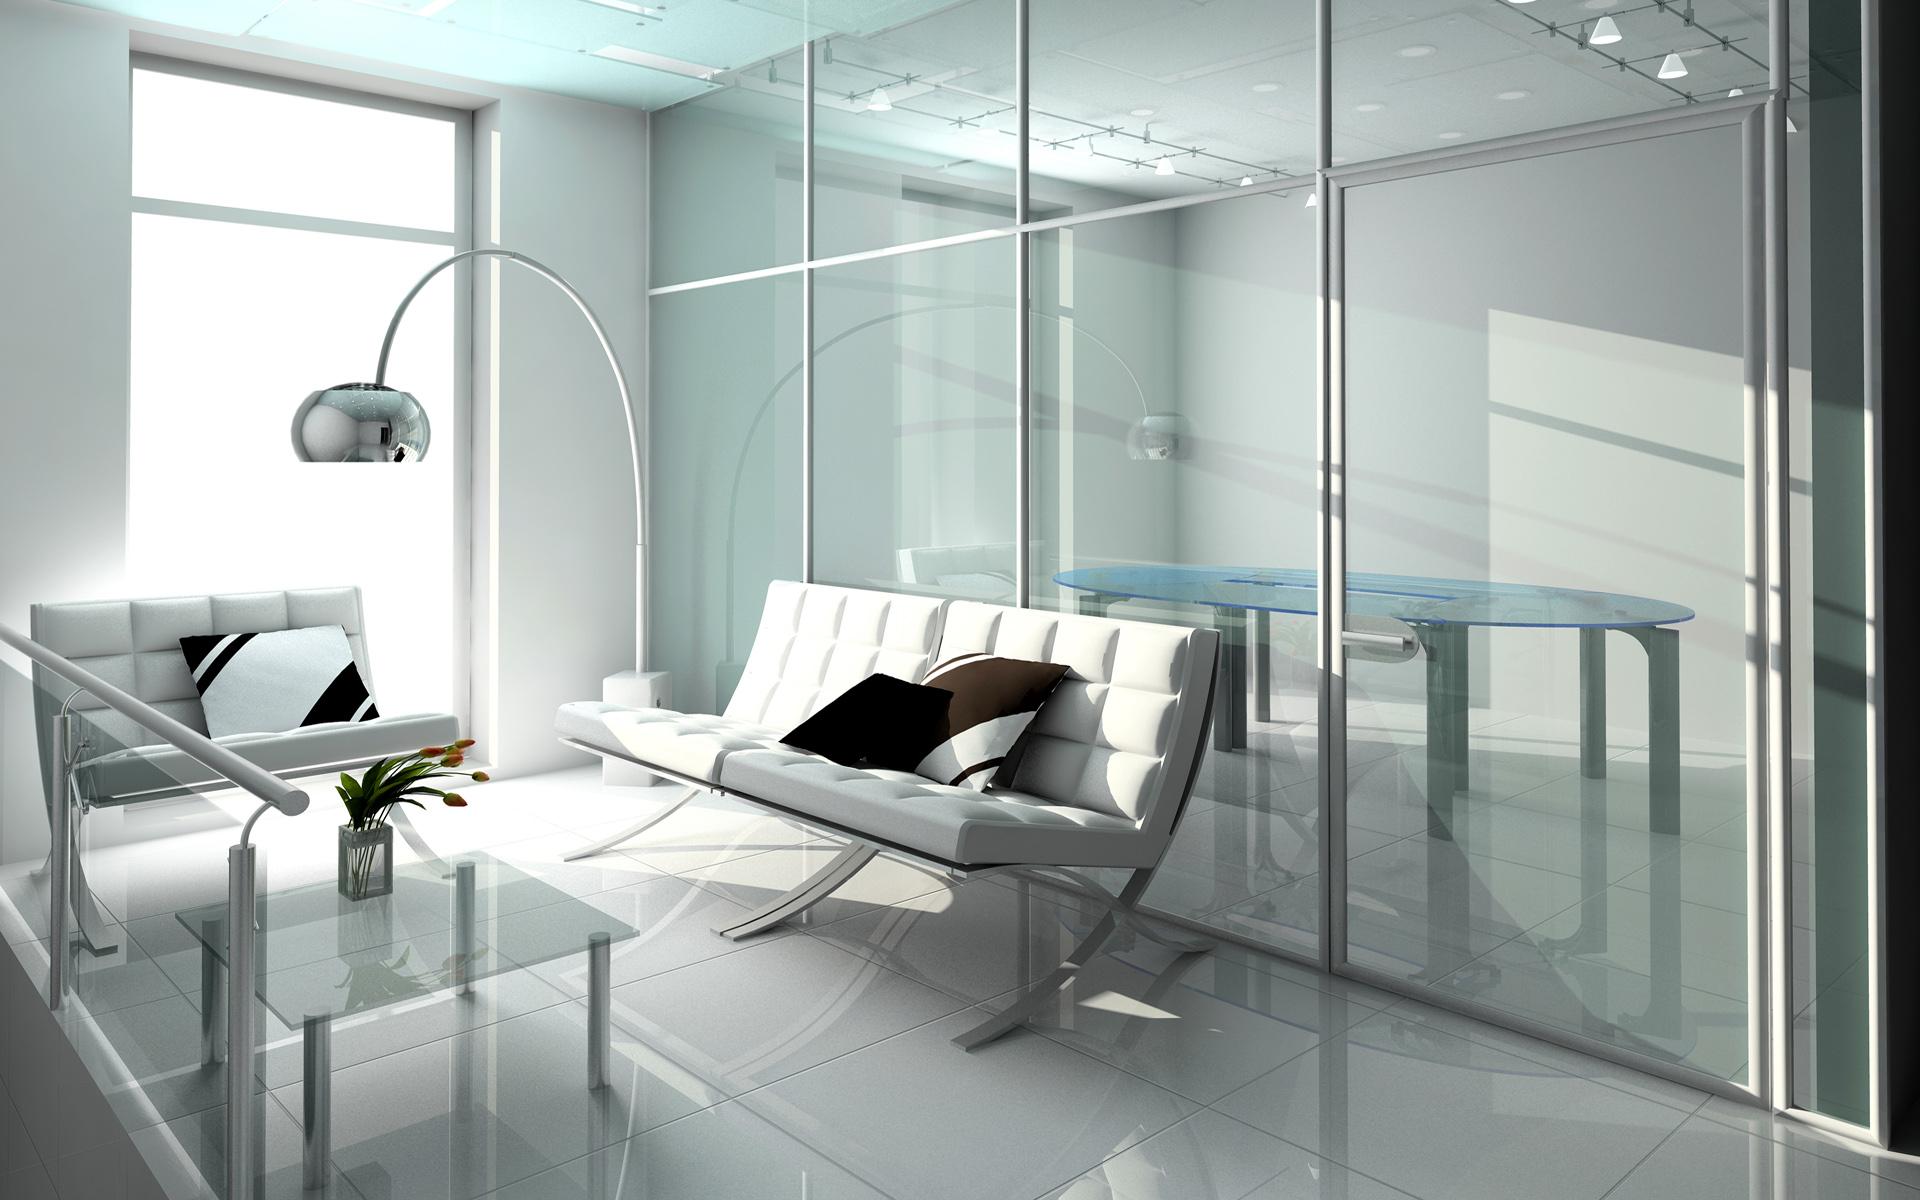 drwaing-room-ideas9 drwaing room ideas